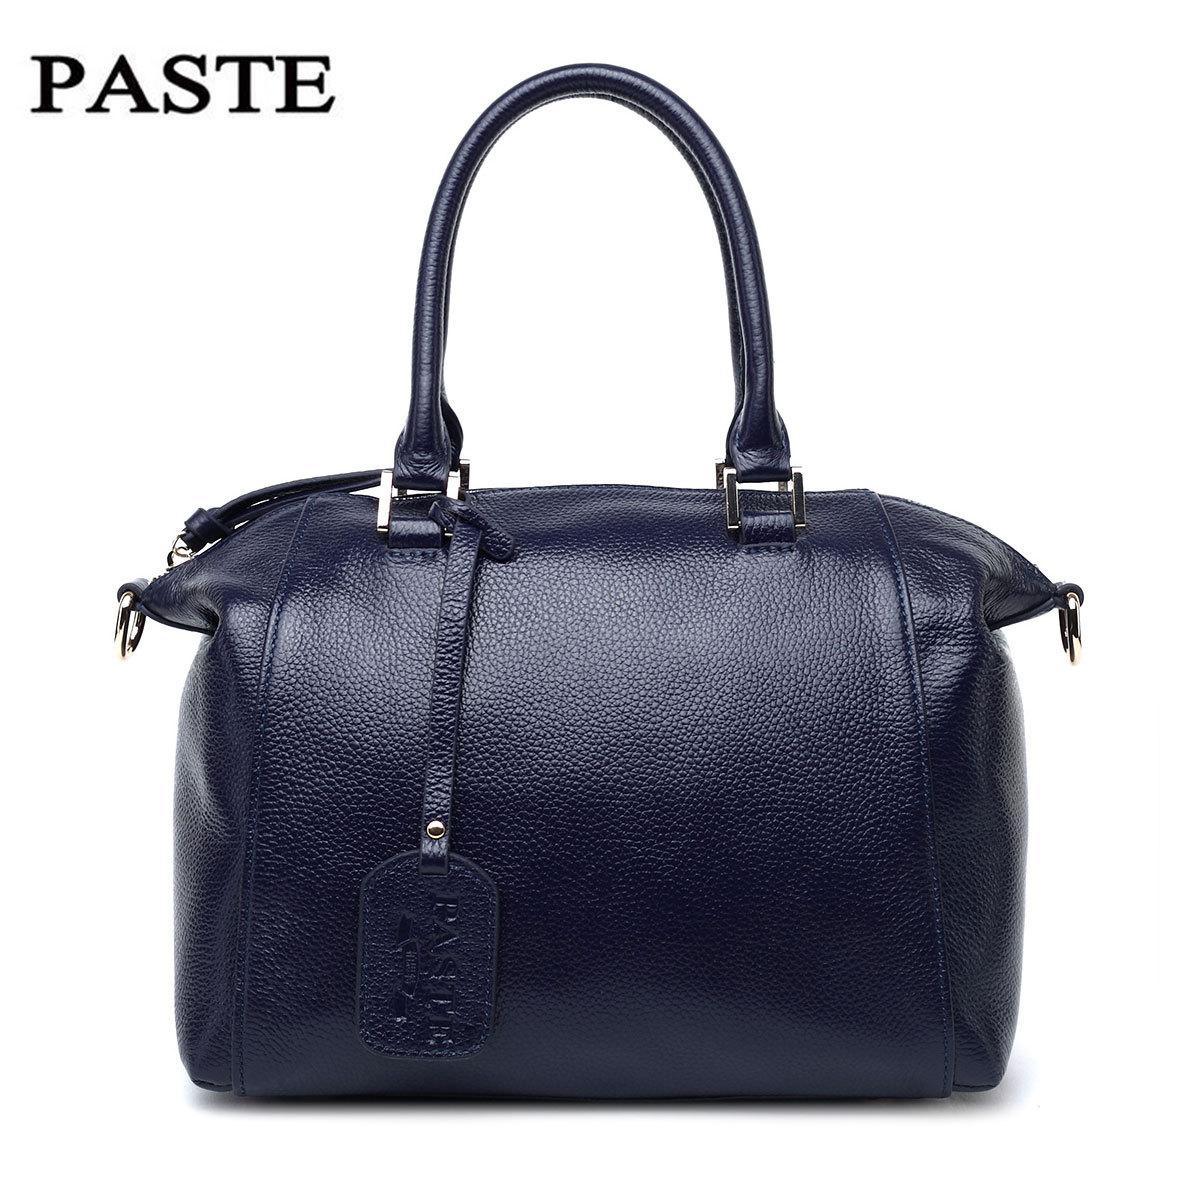 Фотография Hot selling luxury fashion genuine leather women handbags high class natural leather vintage style ladies messenger bags